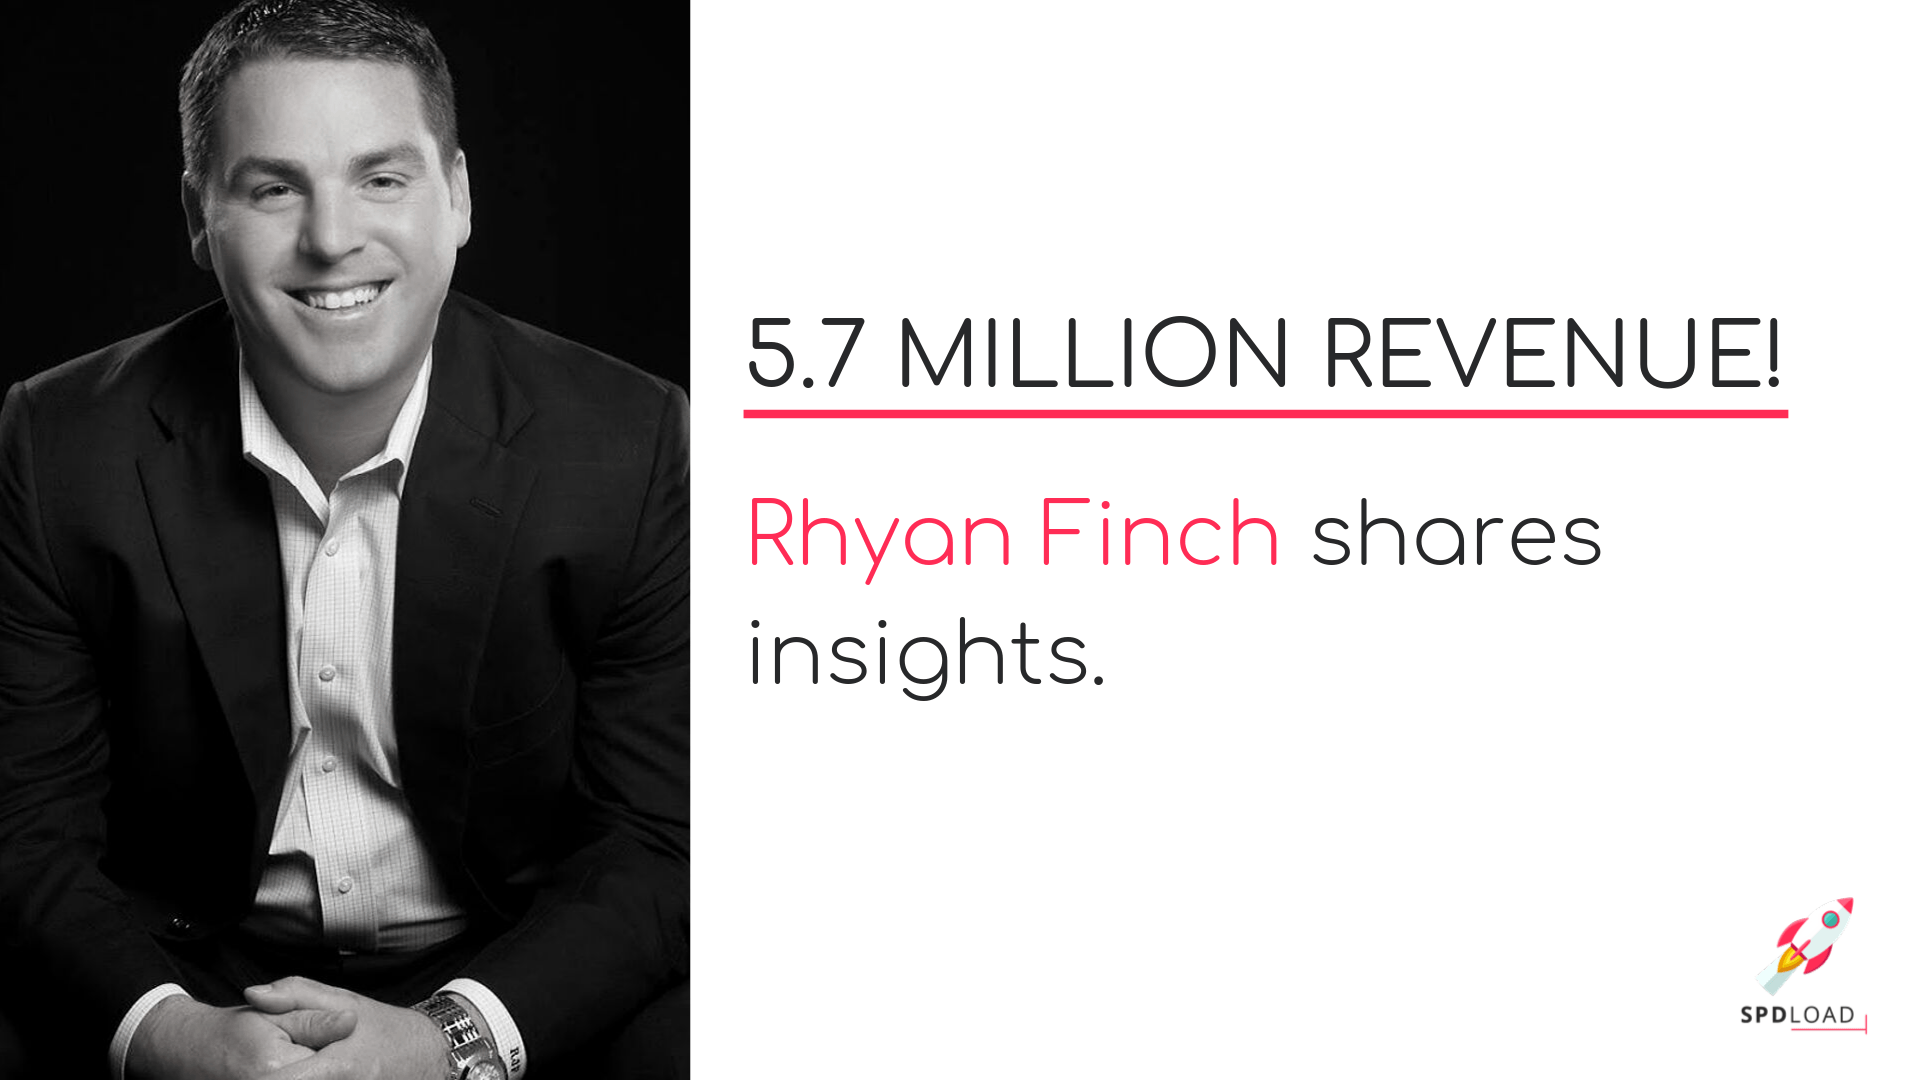 Rhyan Finch shares insights